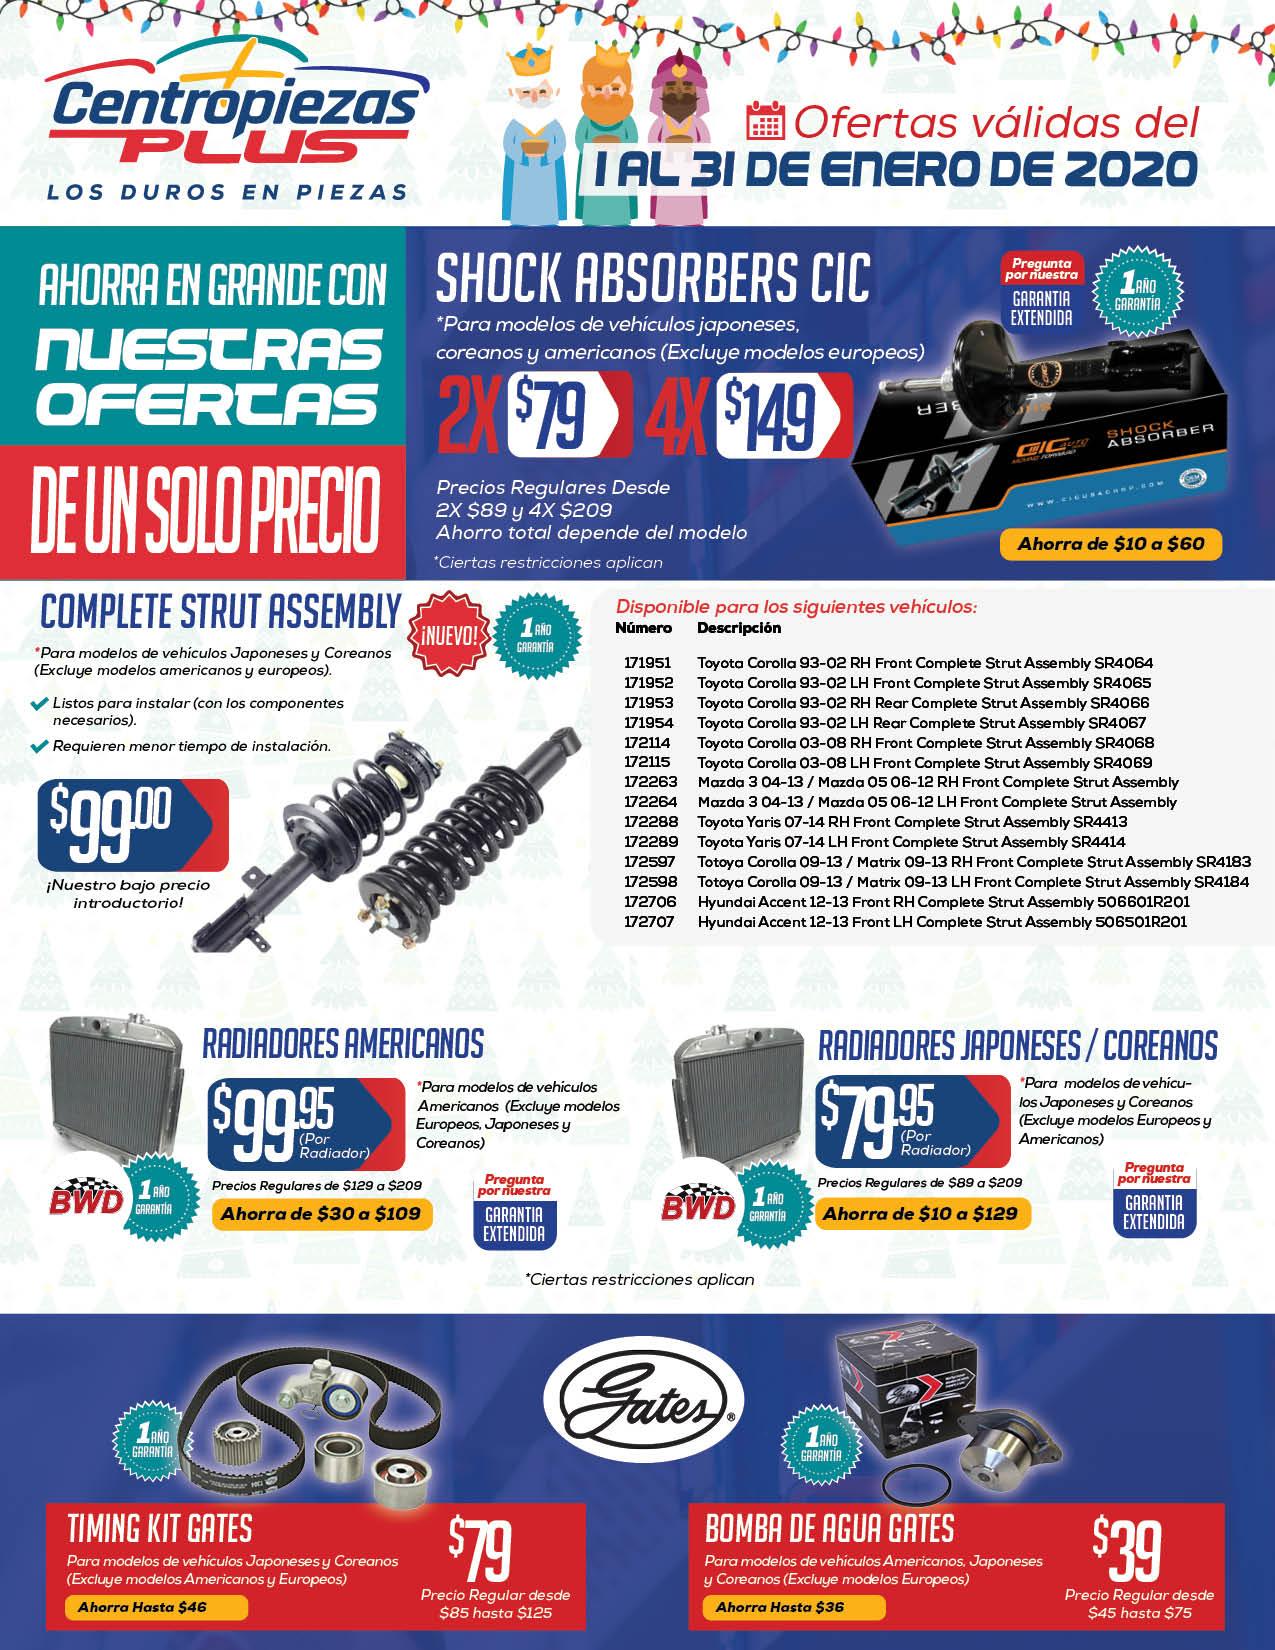 Centropiezas Plus shopper enero 2020